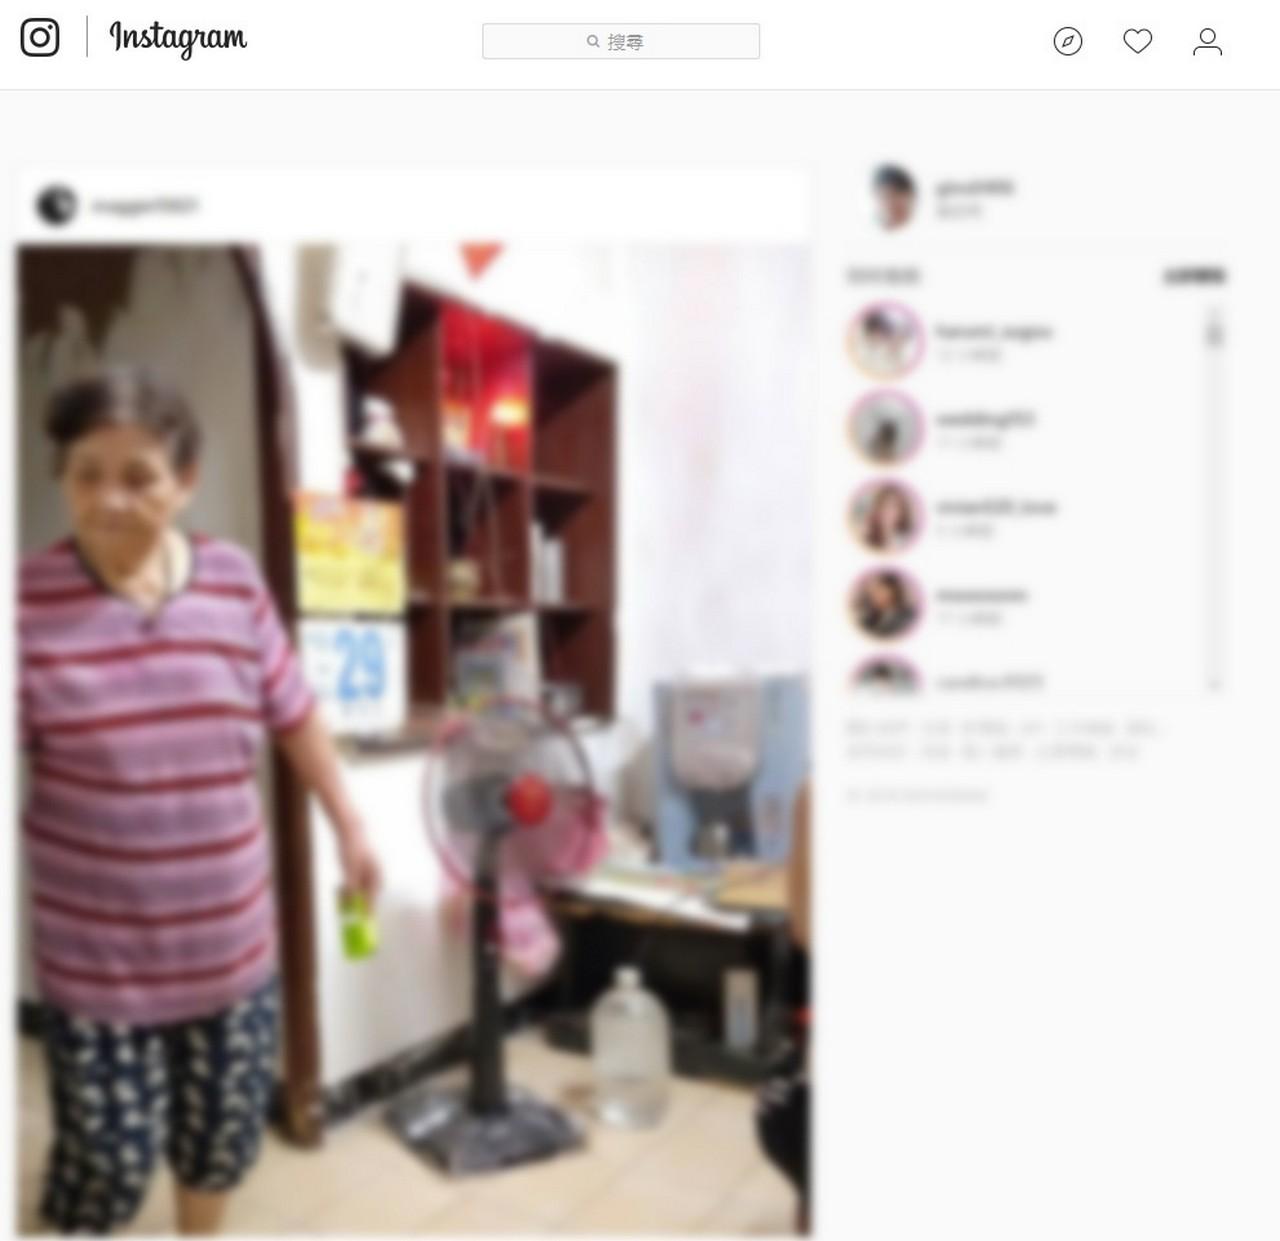 instagram 電腦版發文 發照片 免安裝任何軟體